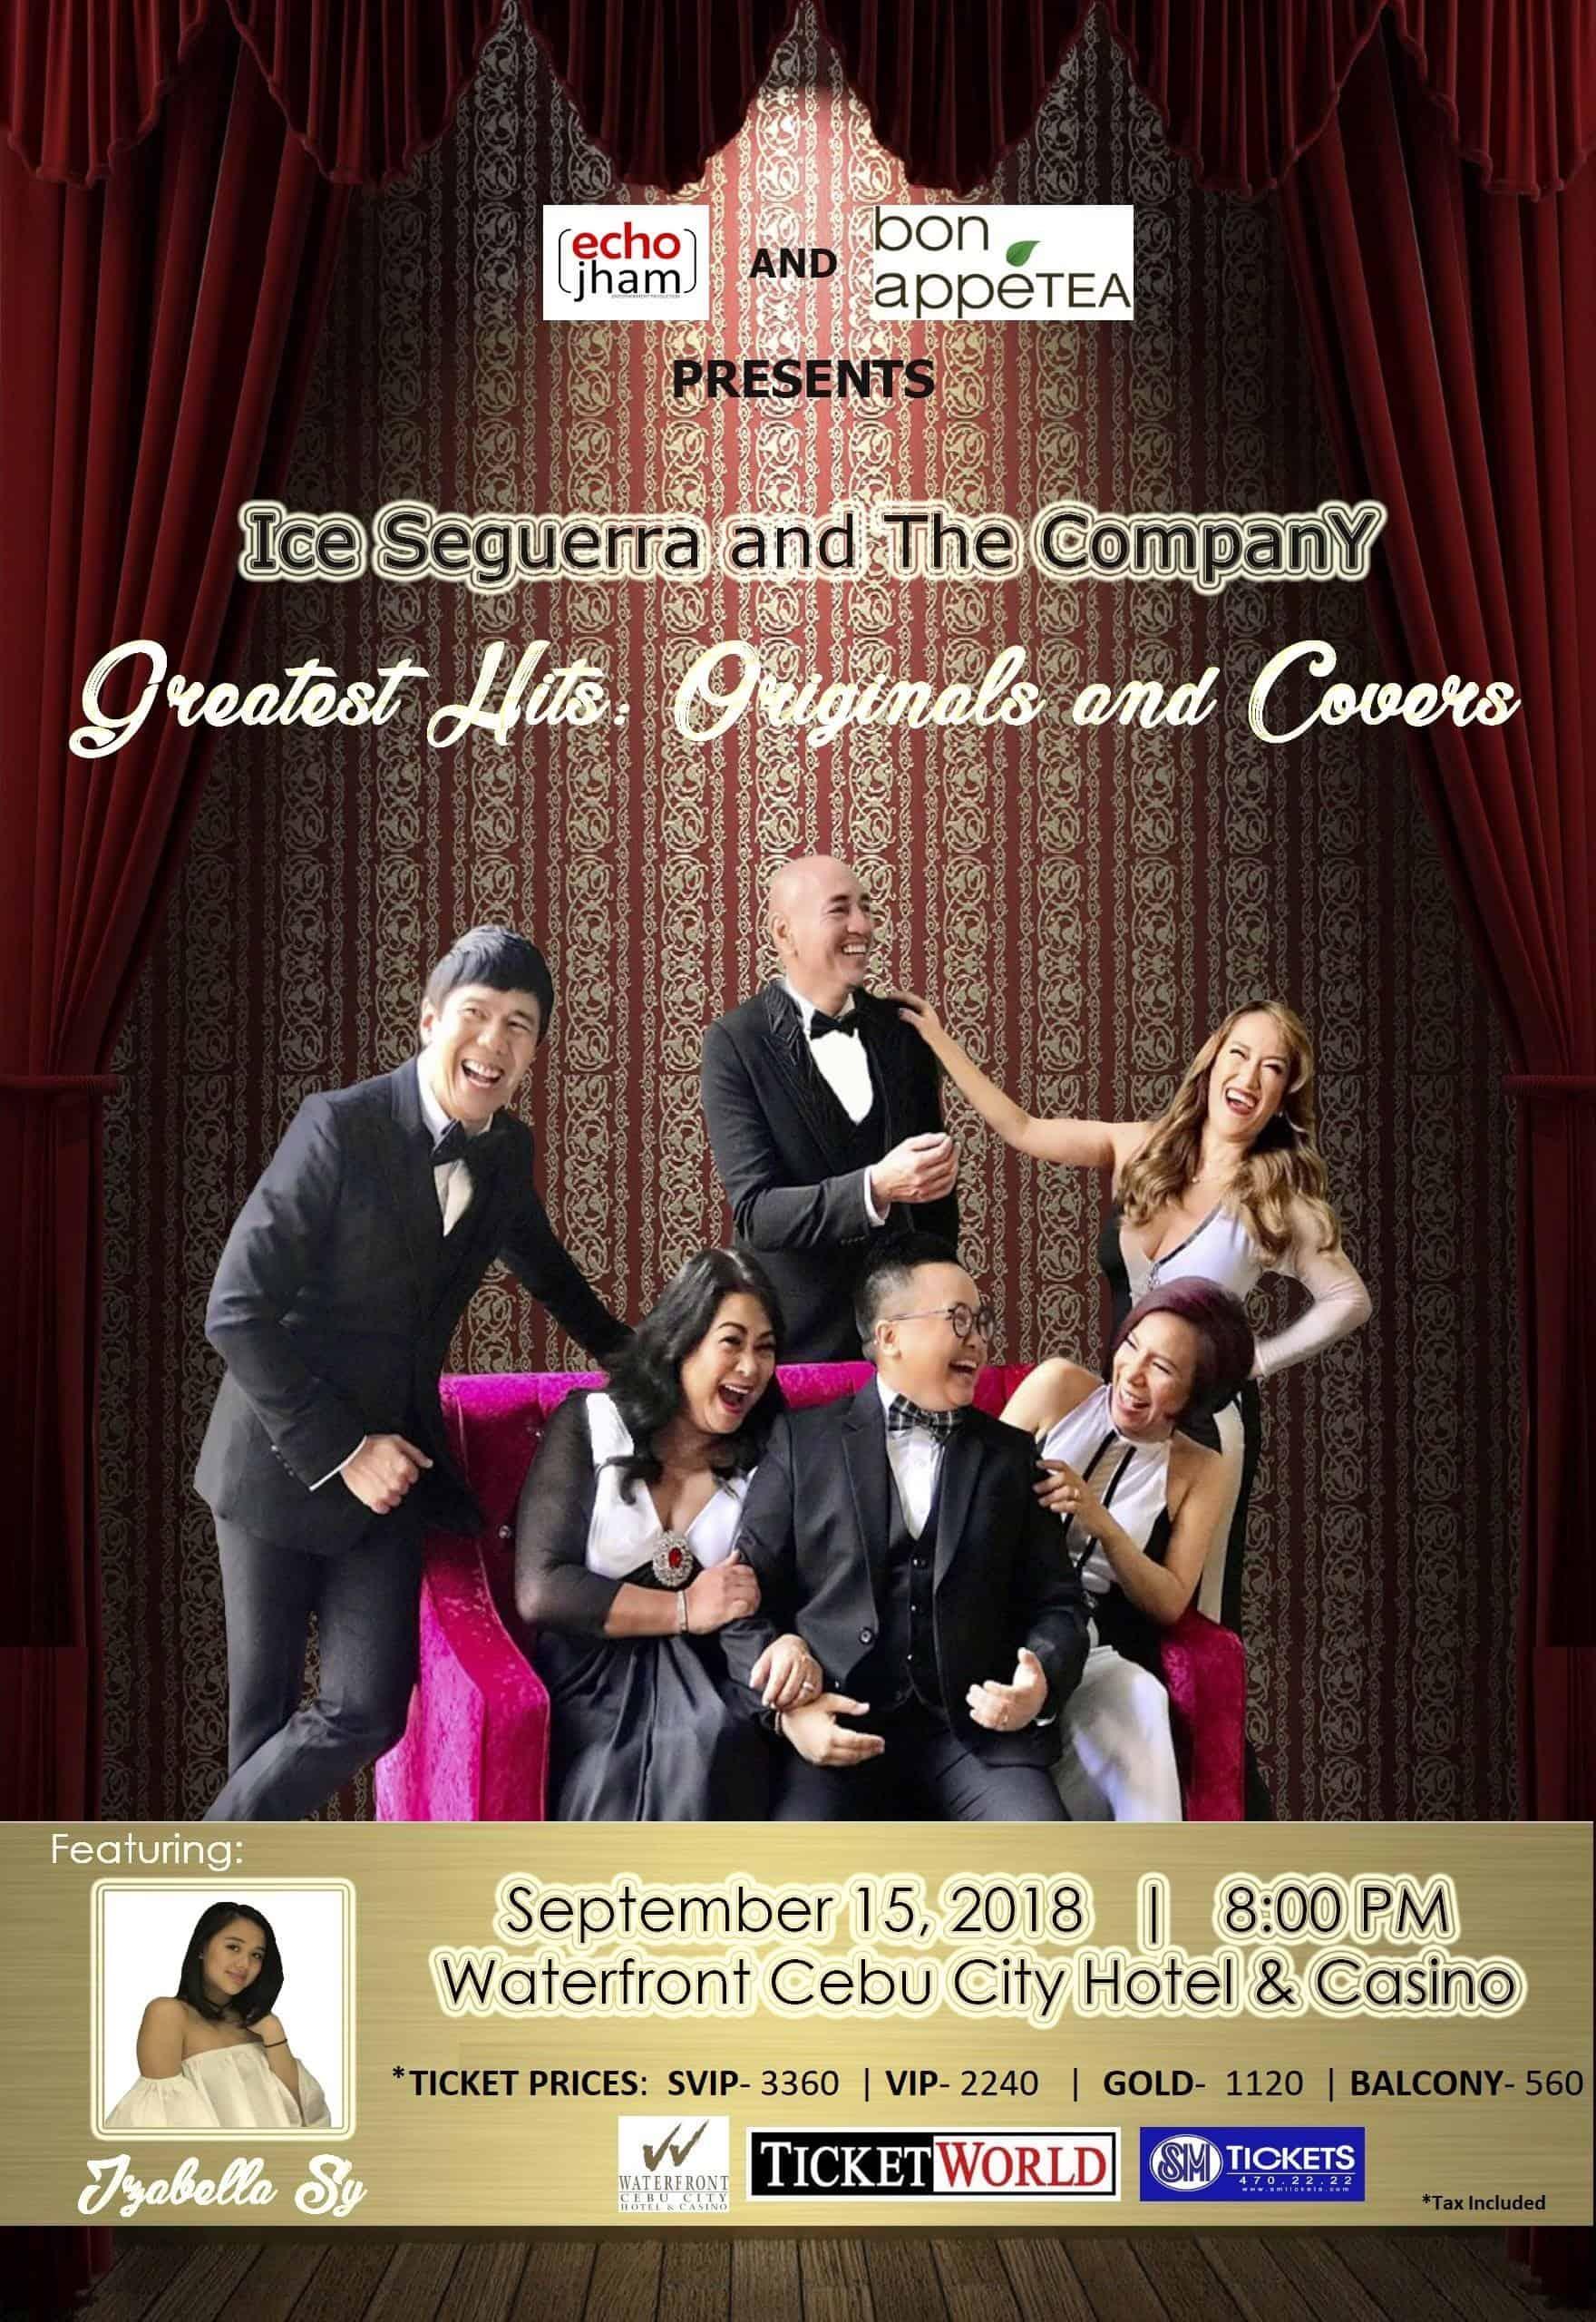 The Company Ice Seguerra Cebu Concert Poster